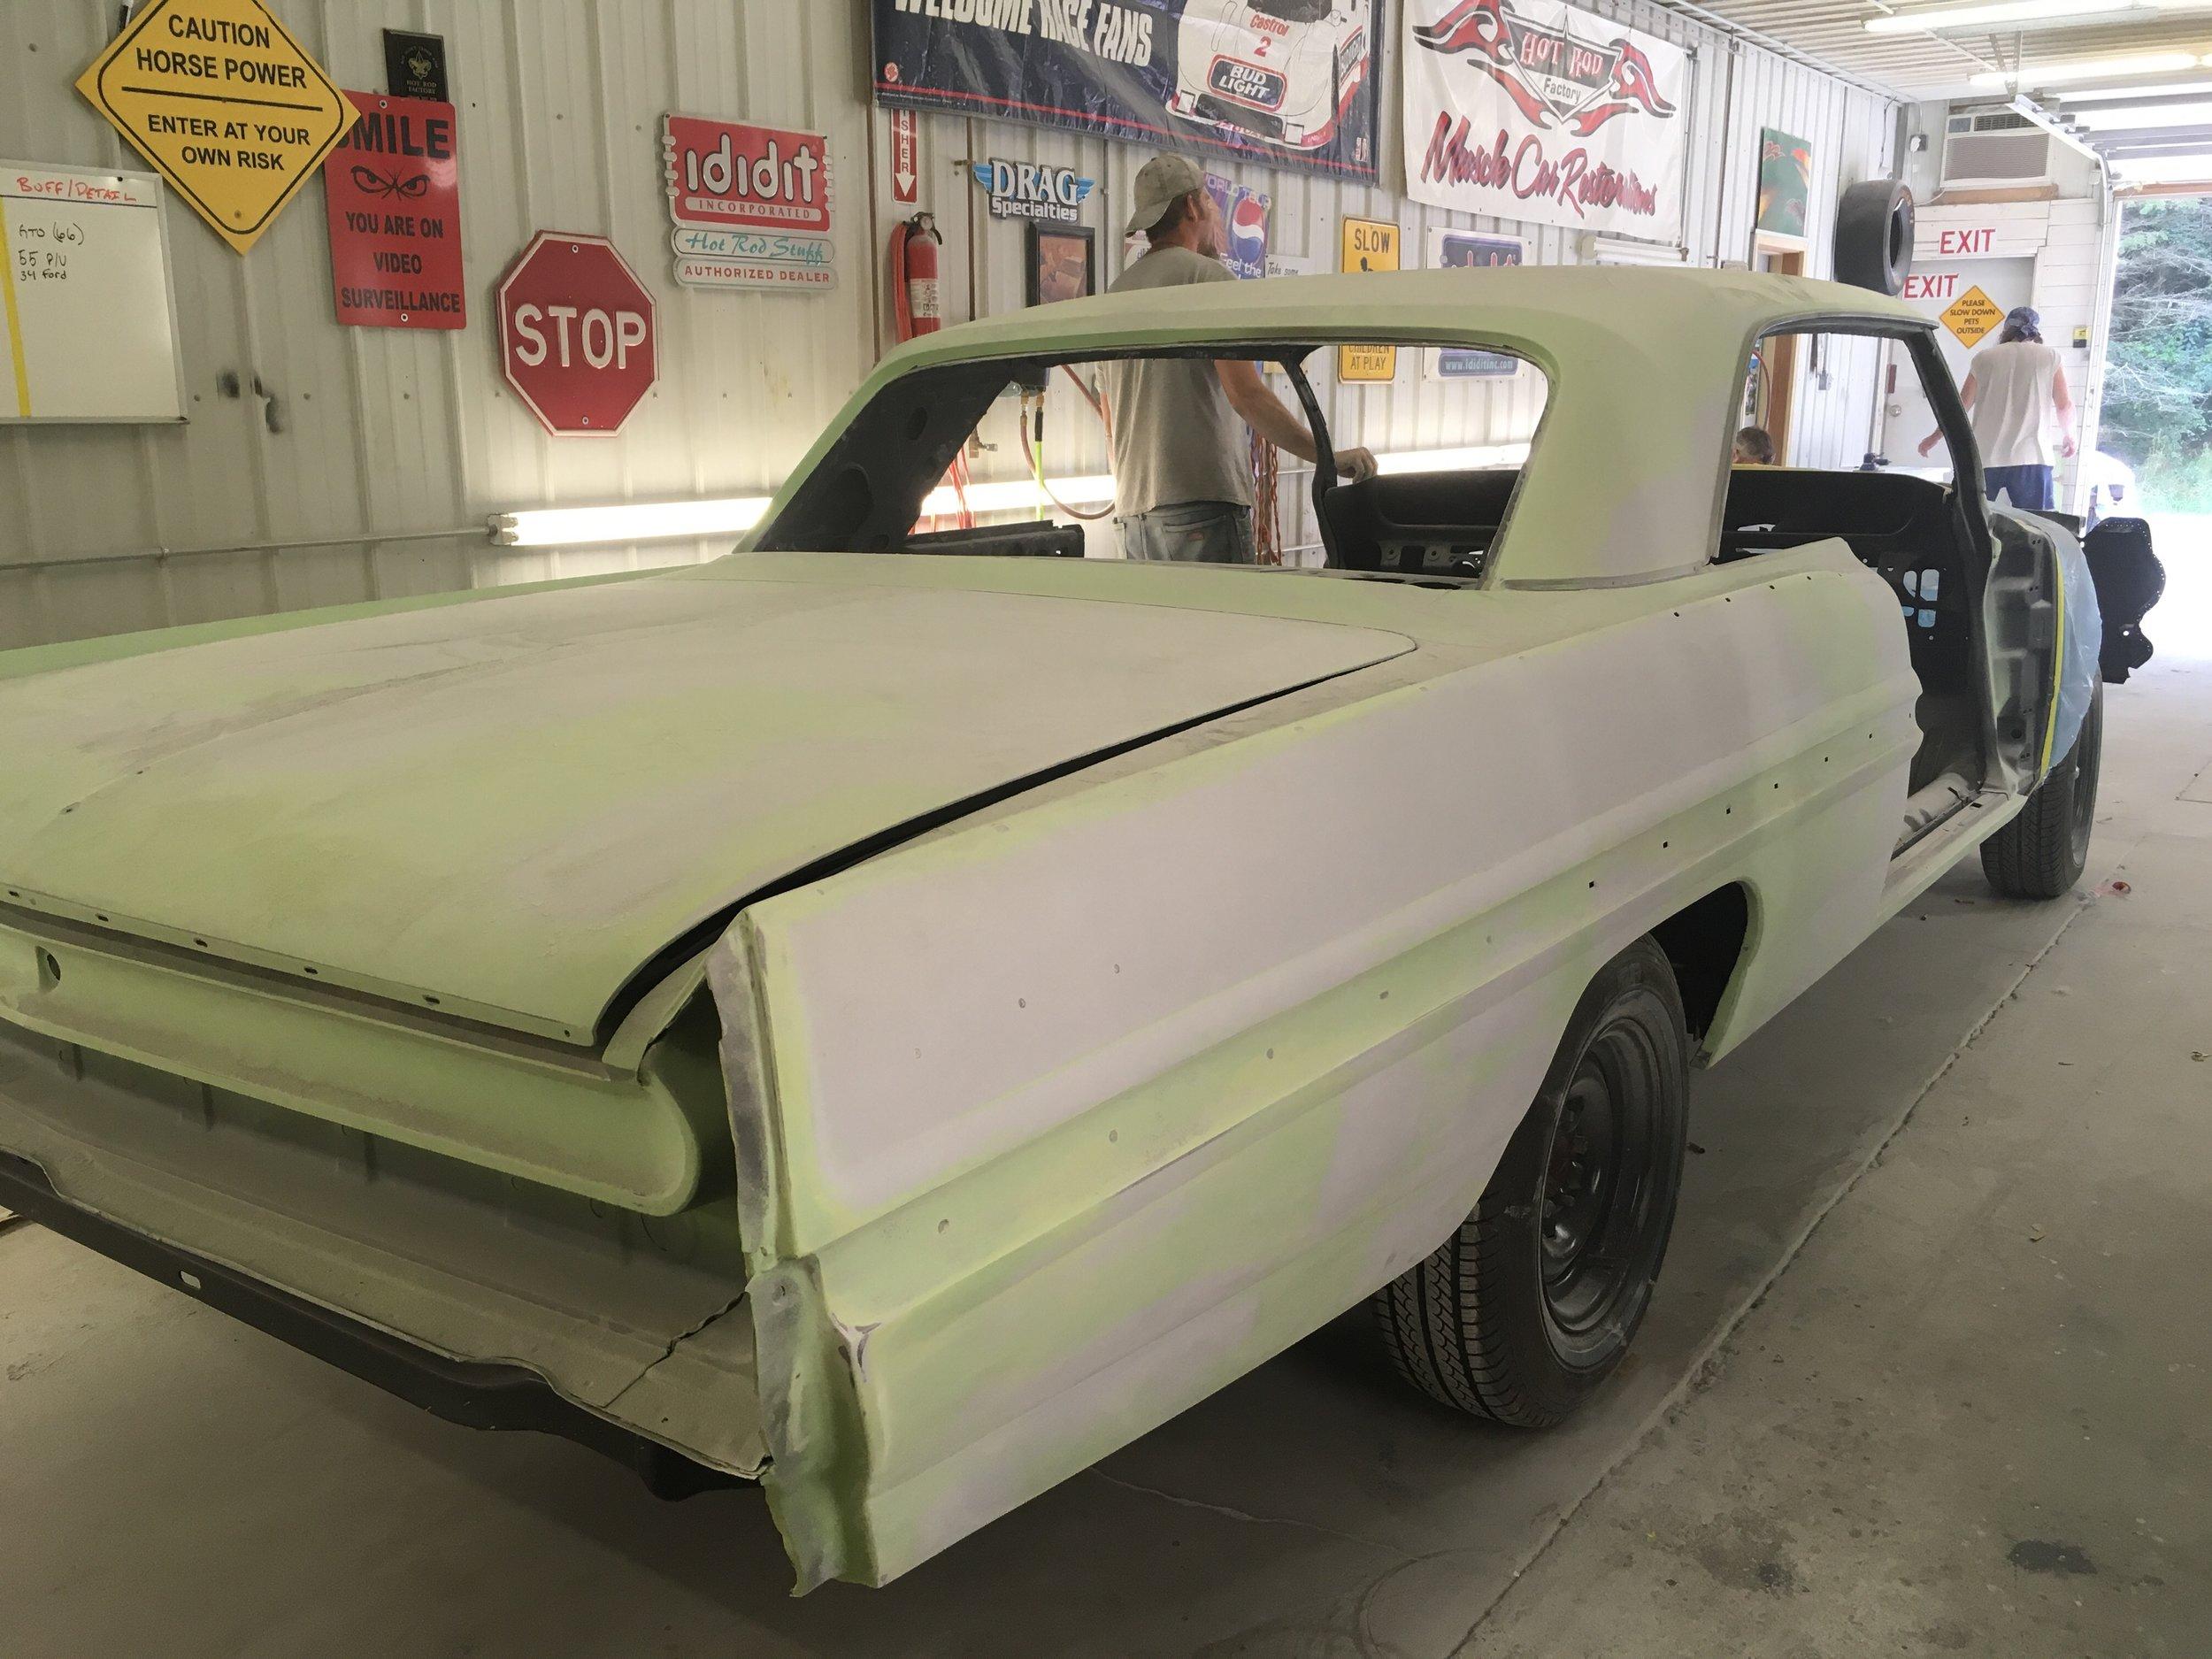 1962-Pontiac-Bonneville-minneapolis-hot-rod-custom-build-restoration-9.jpg